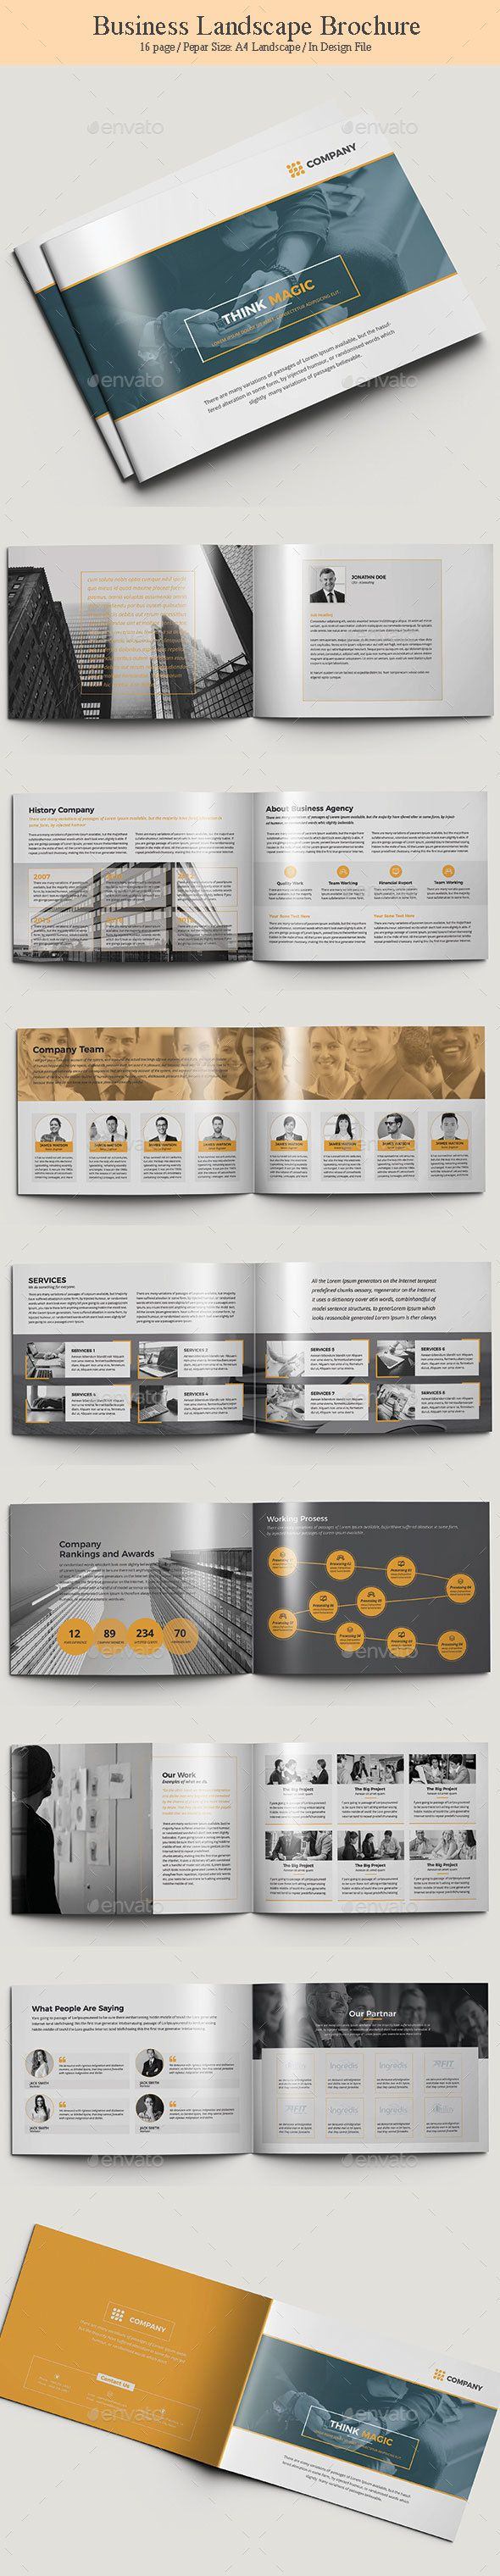 Landscape Brochure Template InDesign INDD - 16 Unique Pages